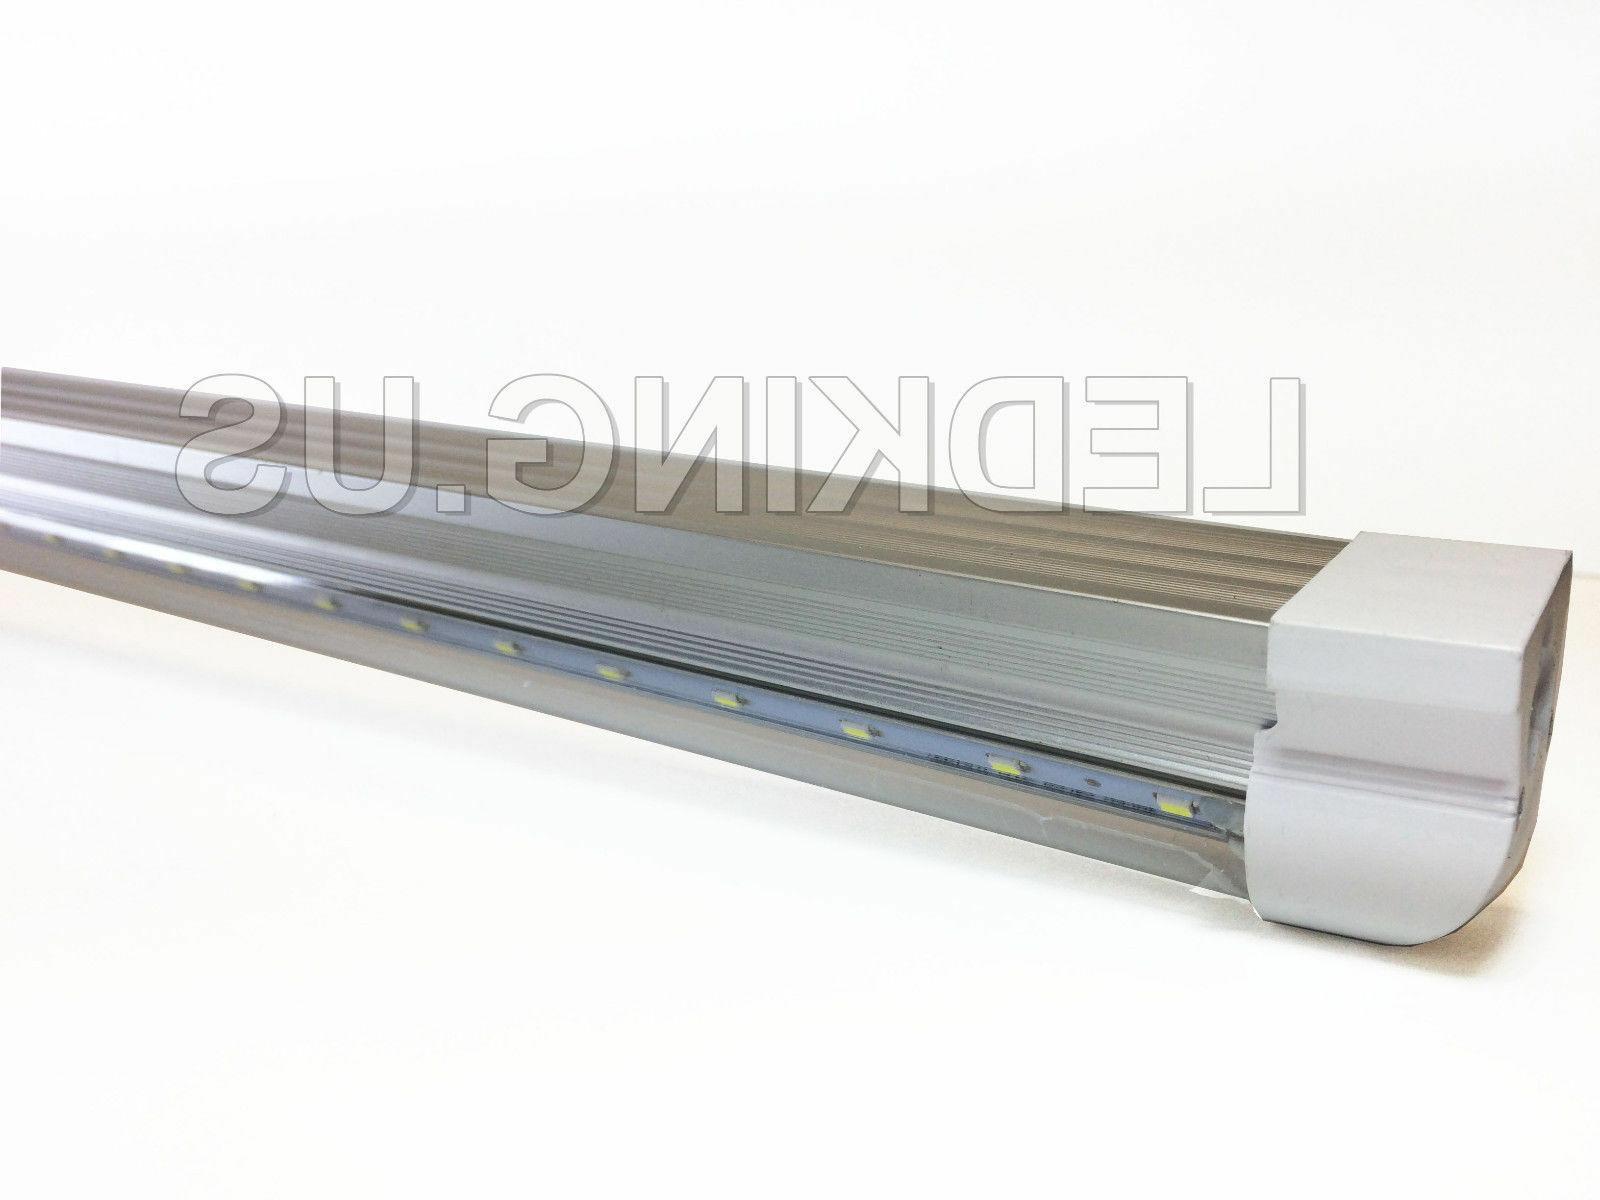 Integrated V-SHAPE 6500K FREEZER LED Tube Light T8 5